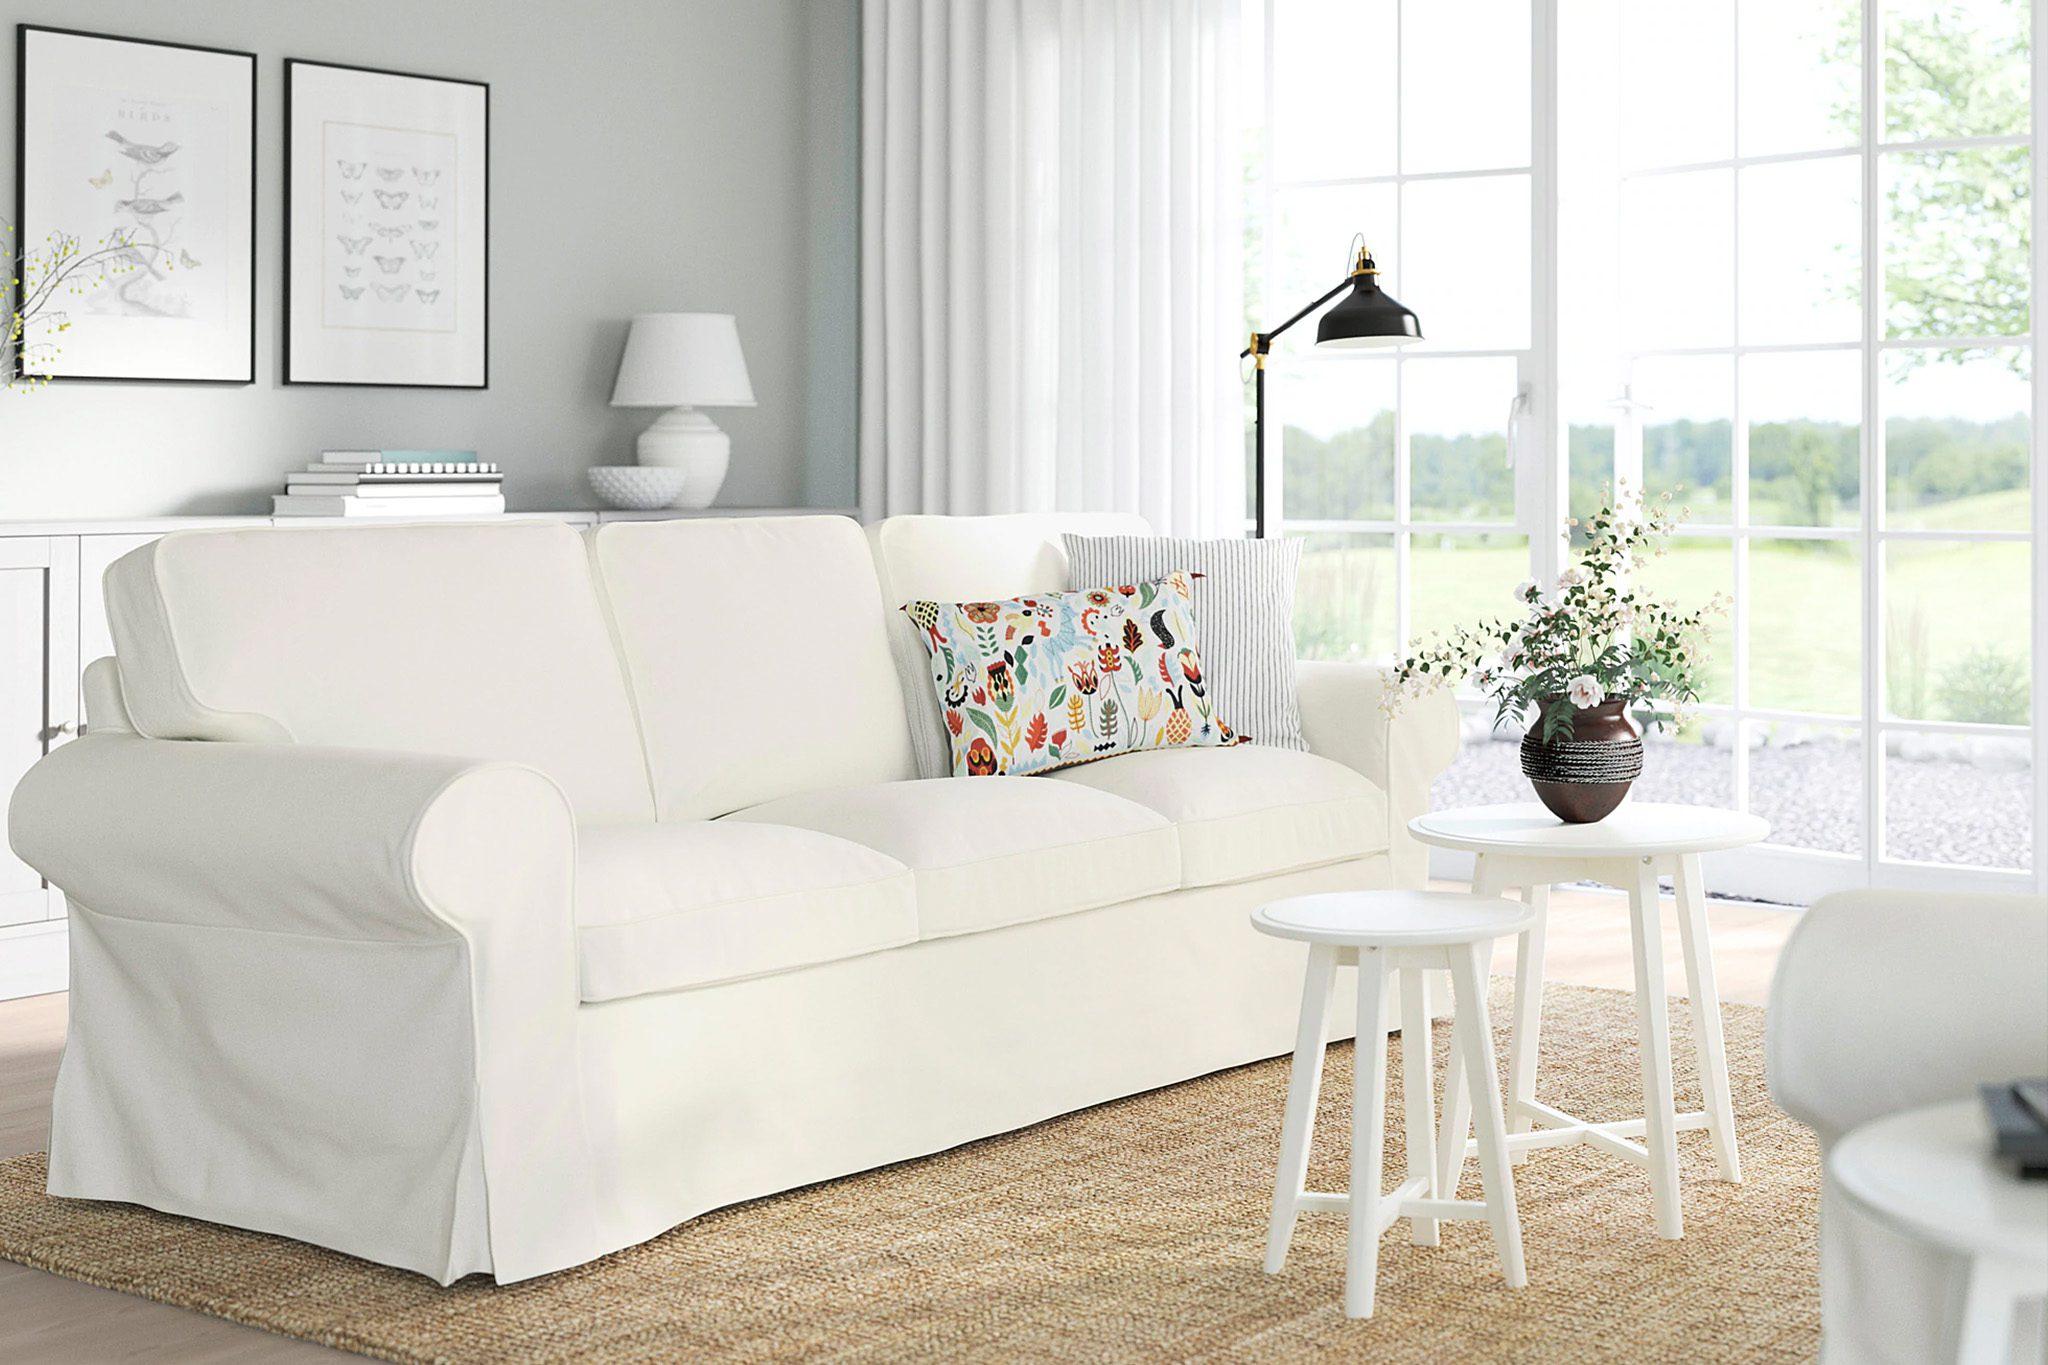 custom-white-uppland-sofa-covers